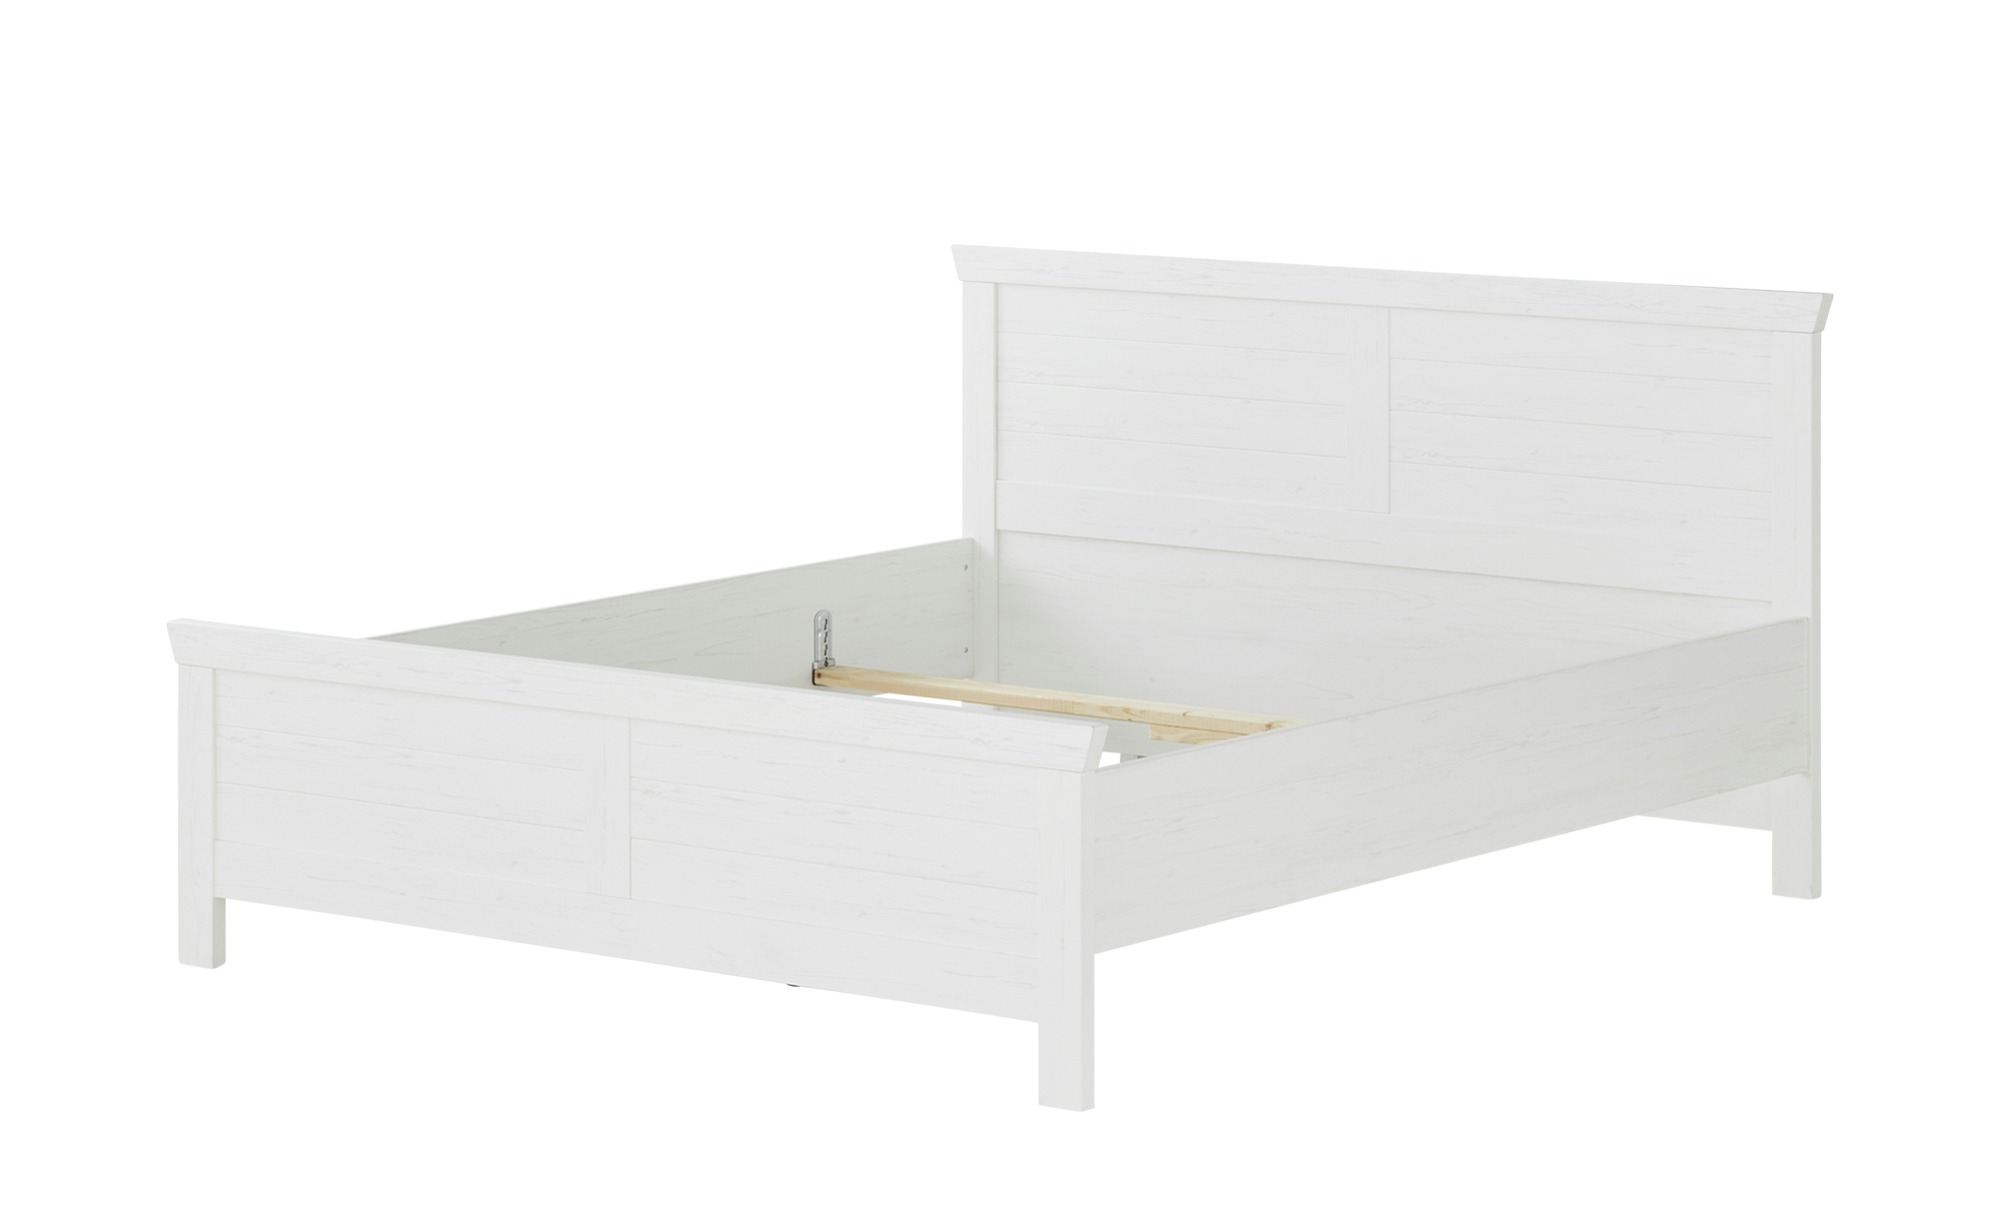 Uno Komplett Schlafzimmer 4 Teilig Bellevue Bettgestell Bett